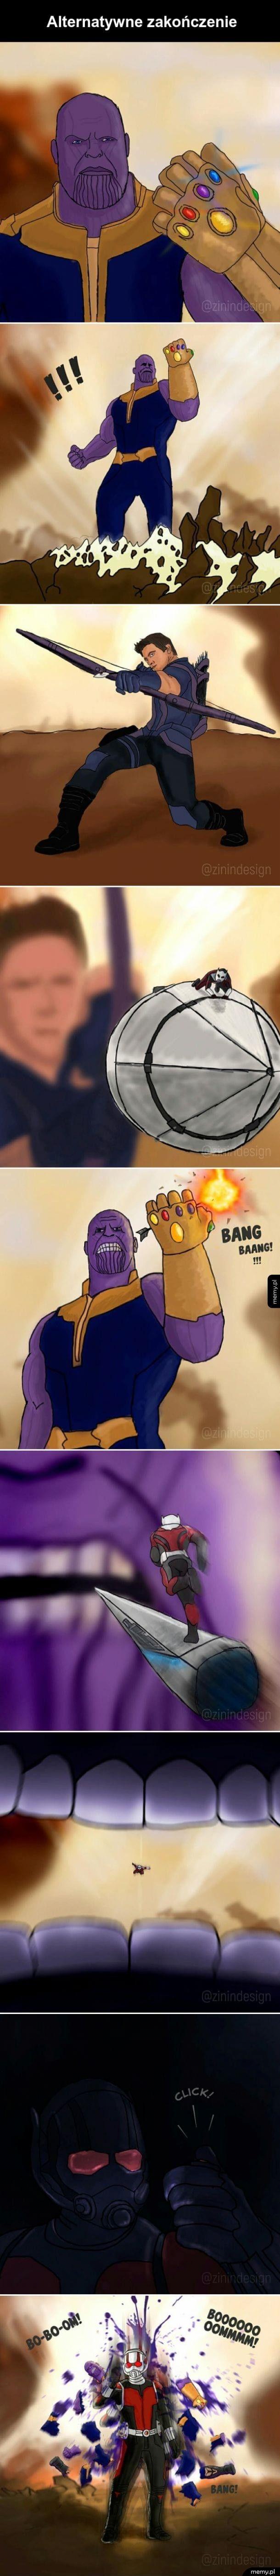 Avengers: Wojna bez granic